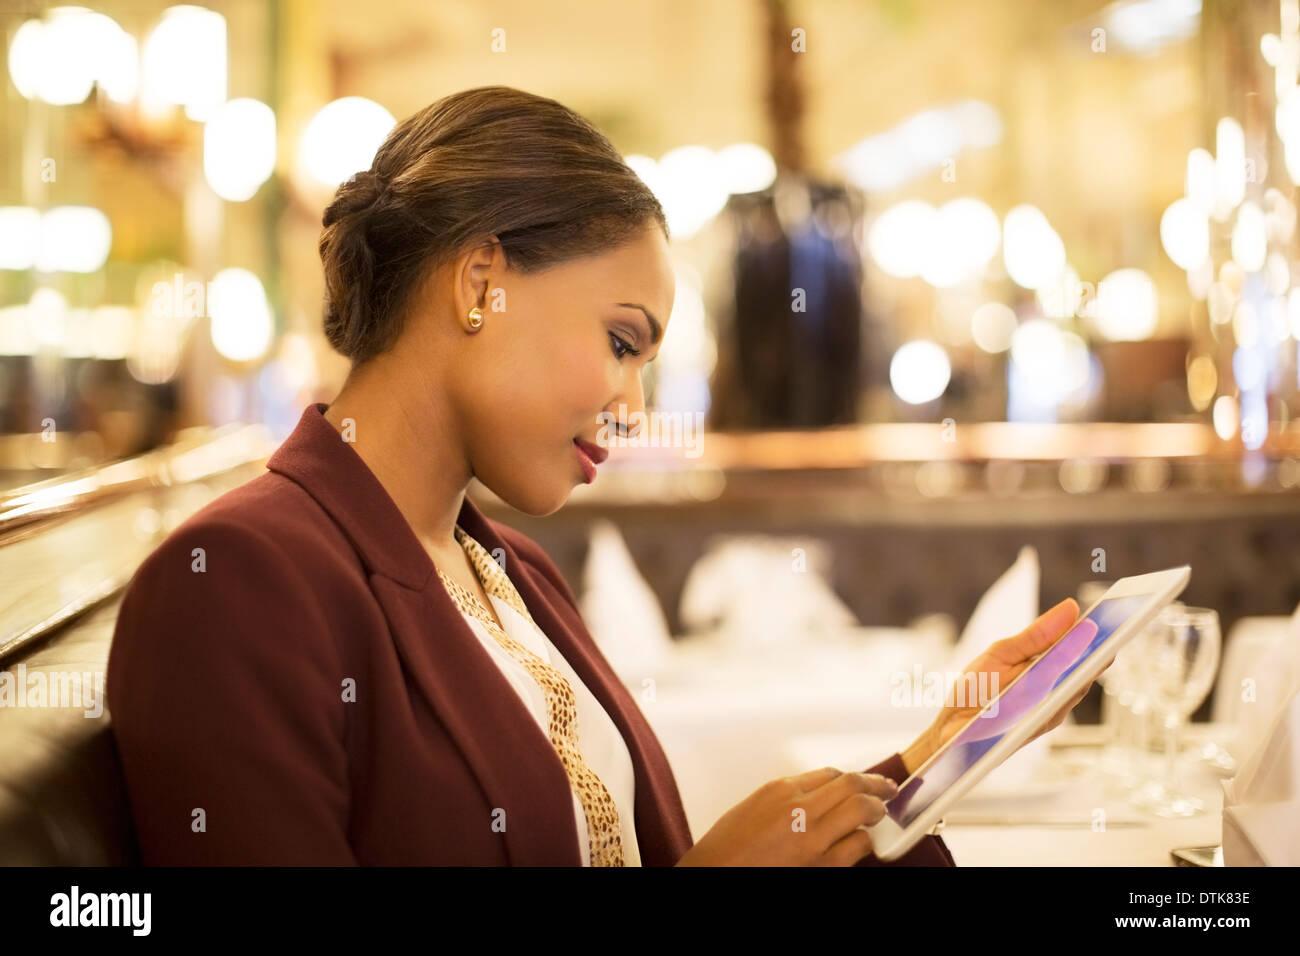 Businesswoman using digital tablet in restaurant - Stock Image